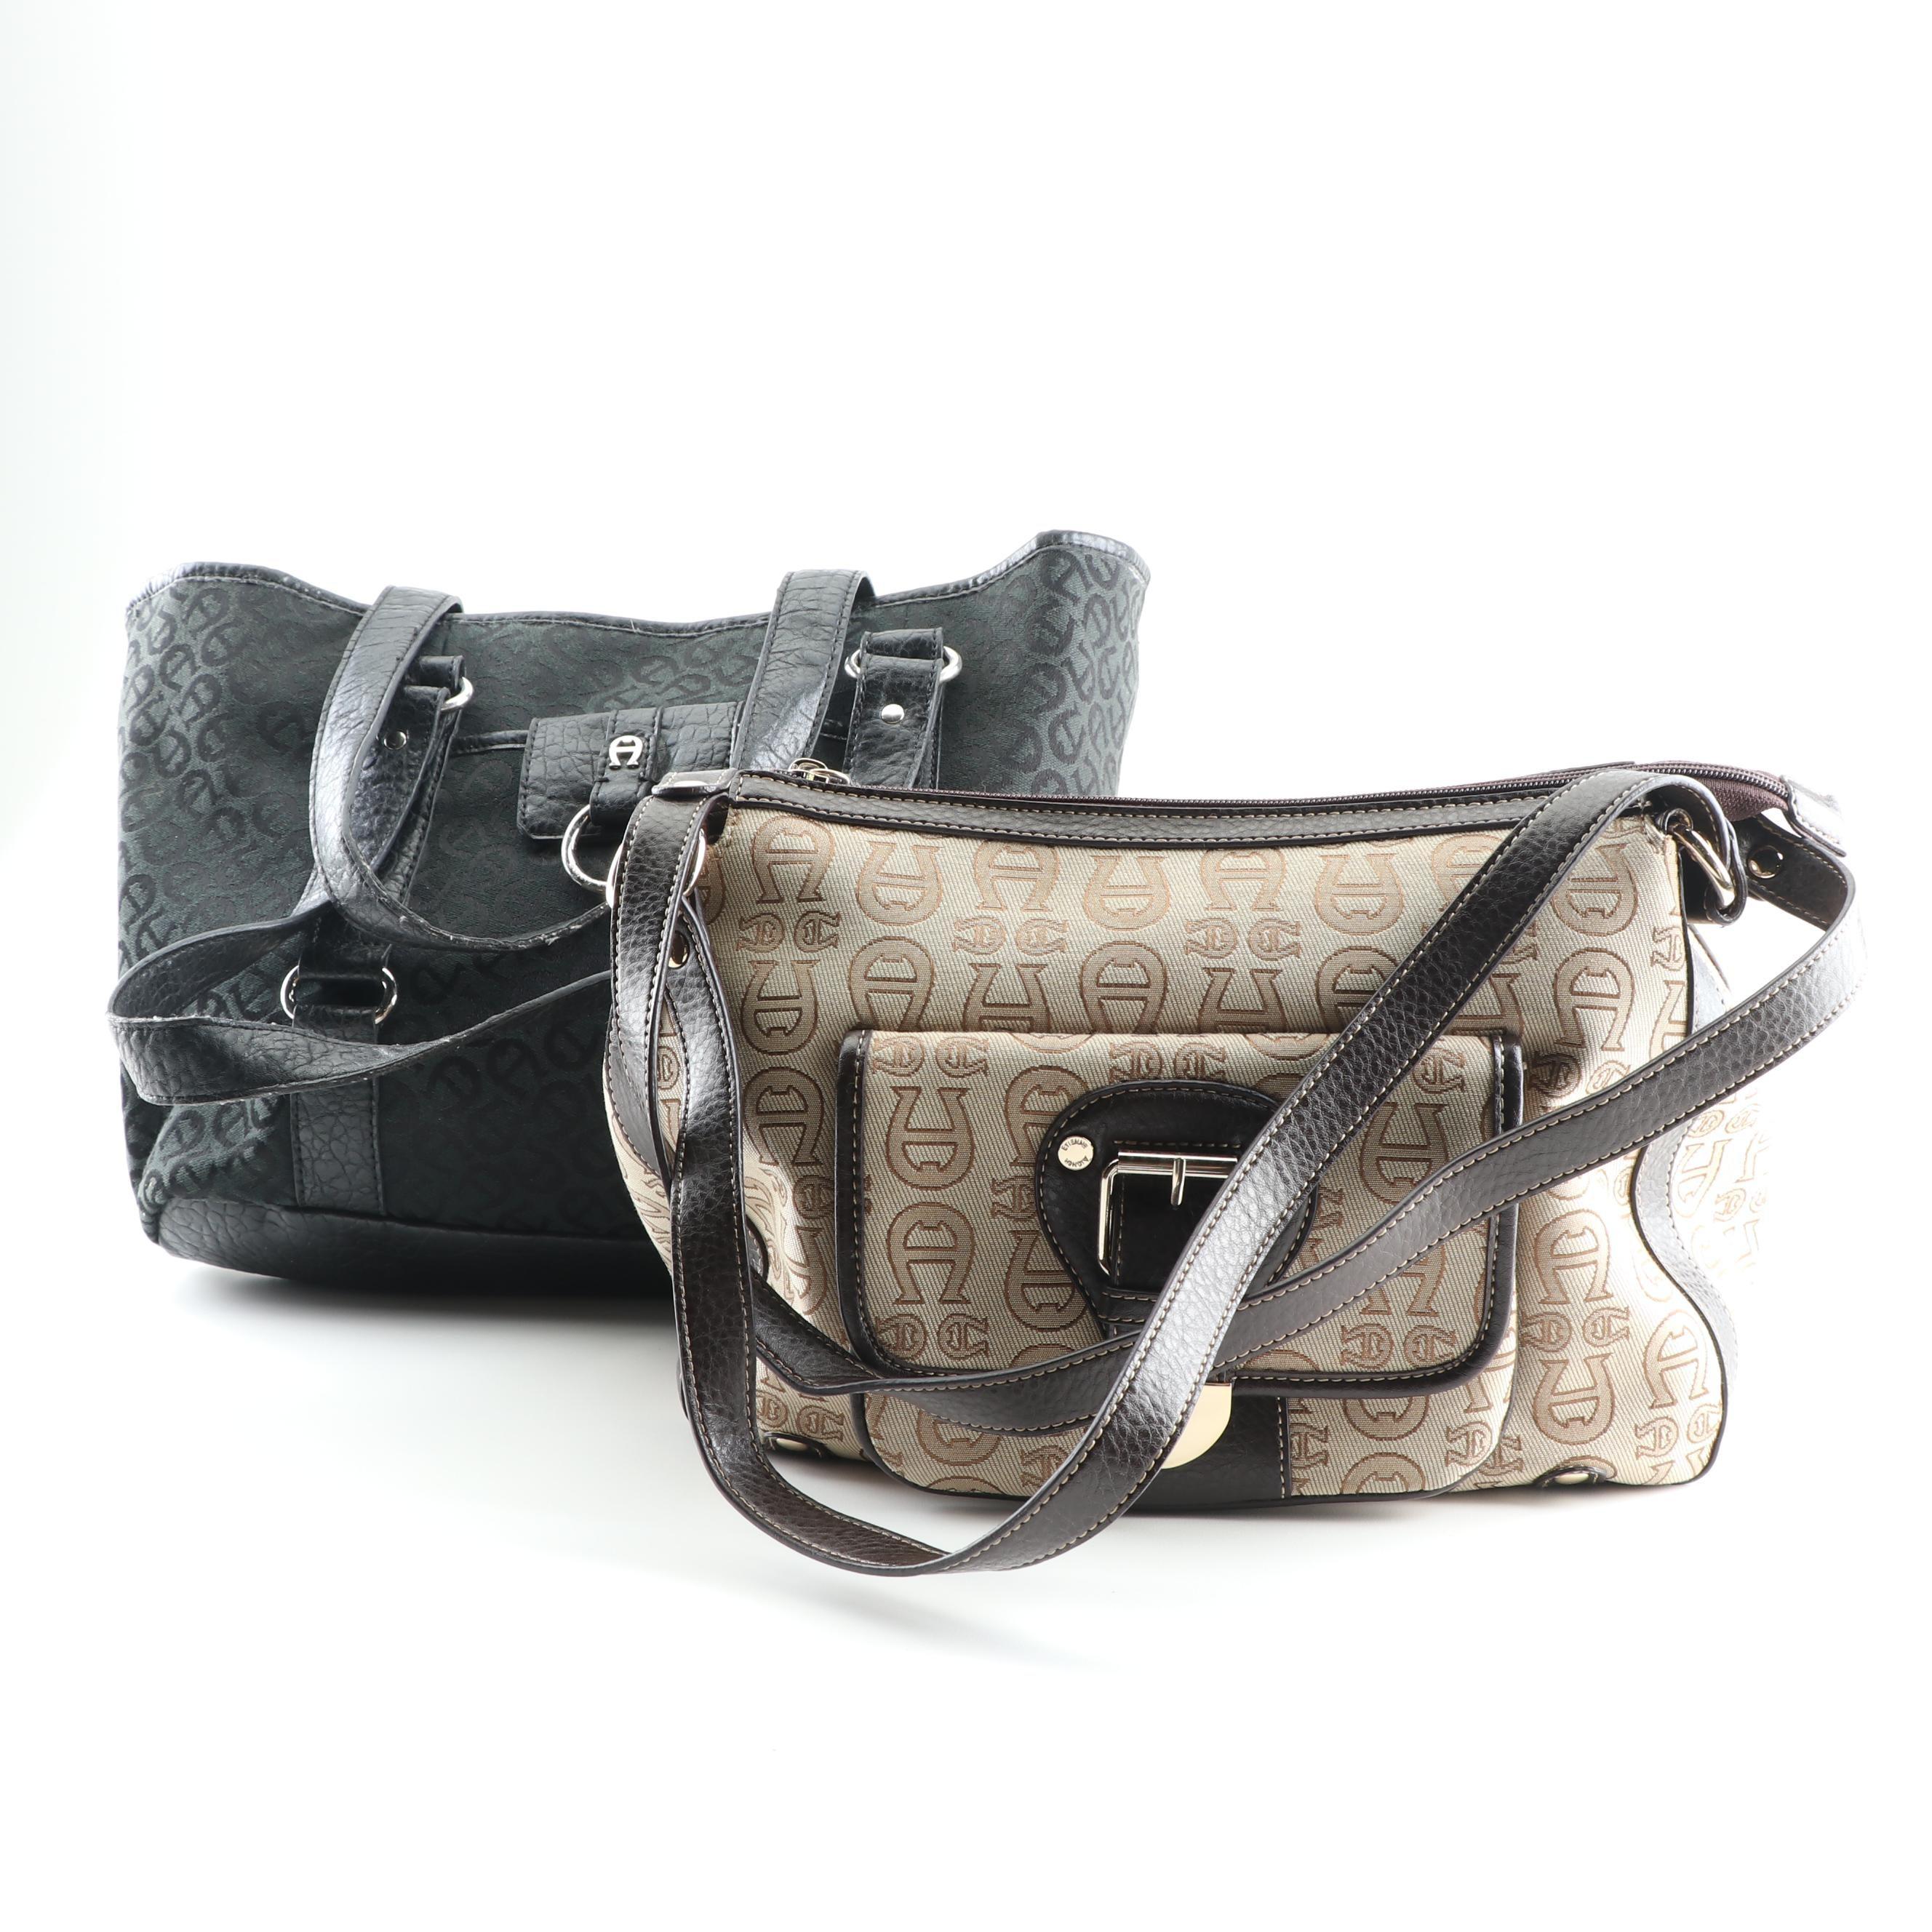 Etienne Aigner Black and Tan Canvas Signature Print Shoulder Bags